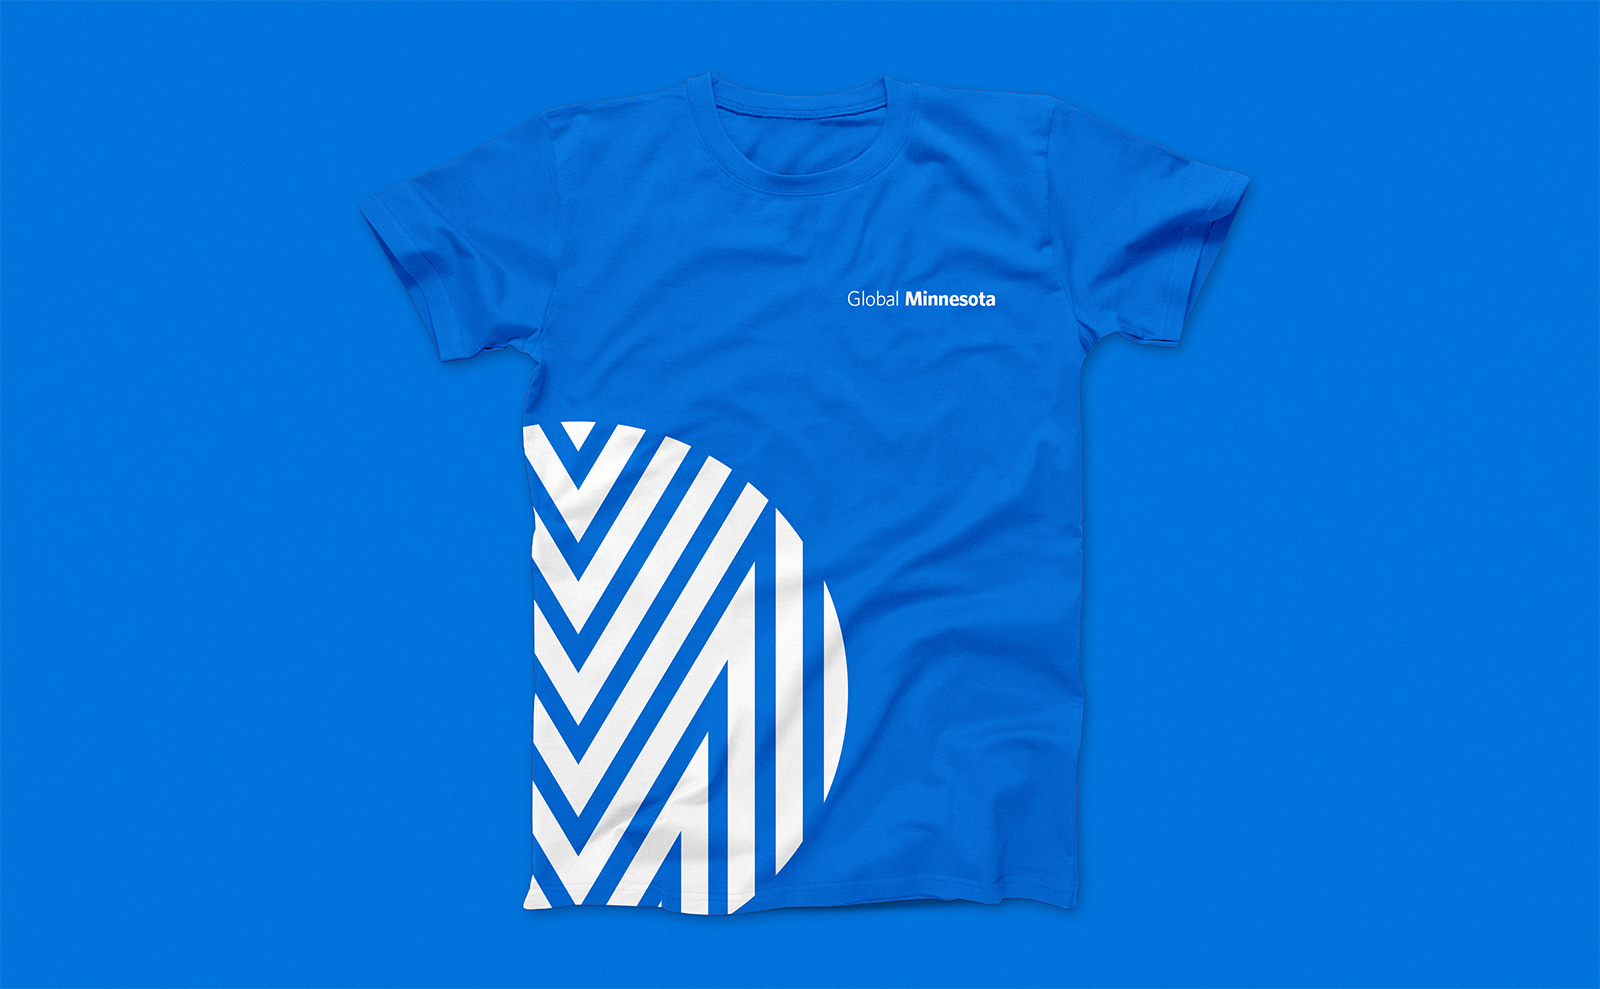 Global Minnesota logo on blue tshirt